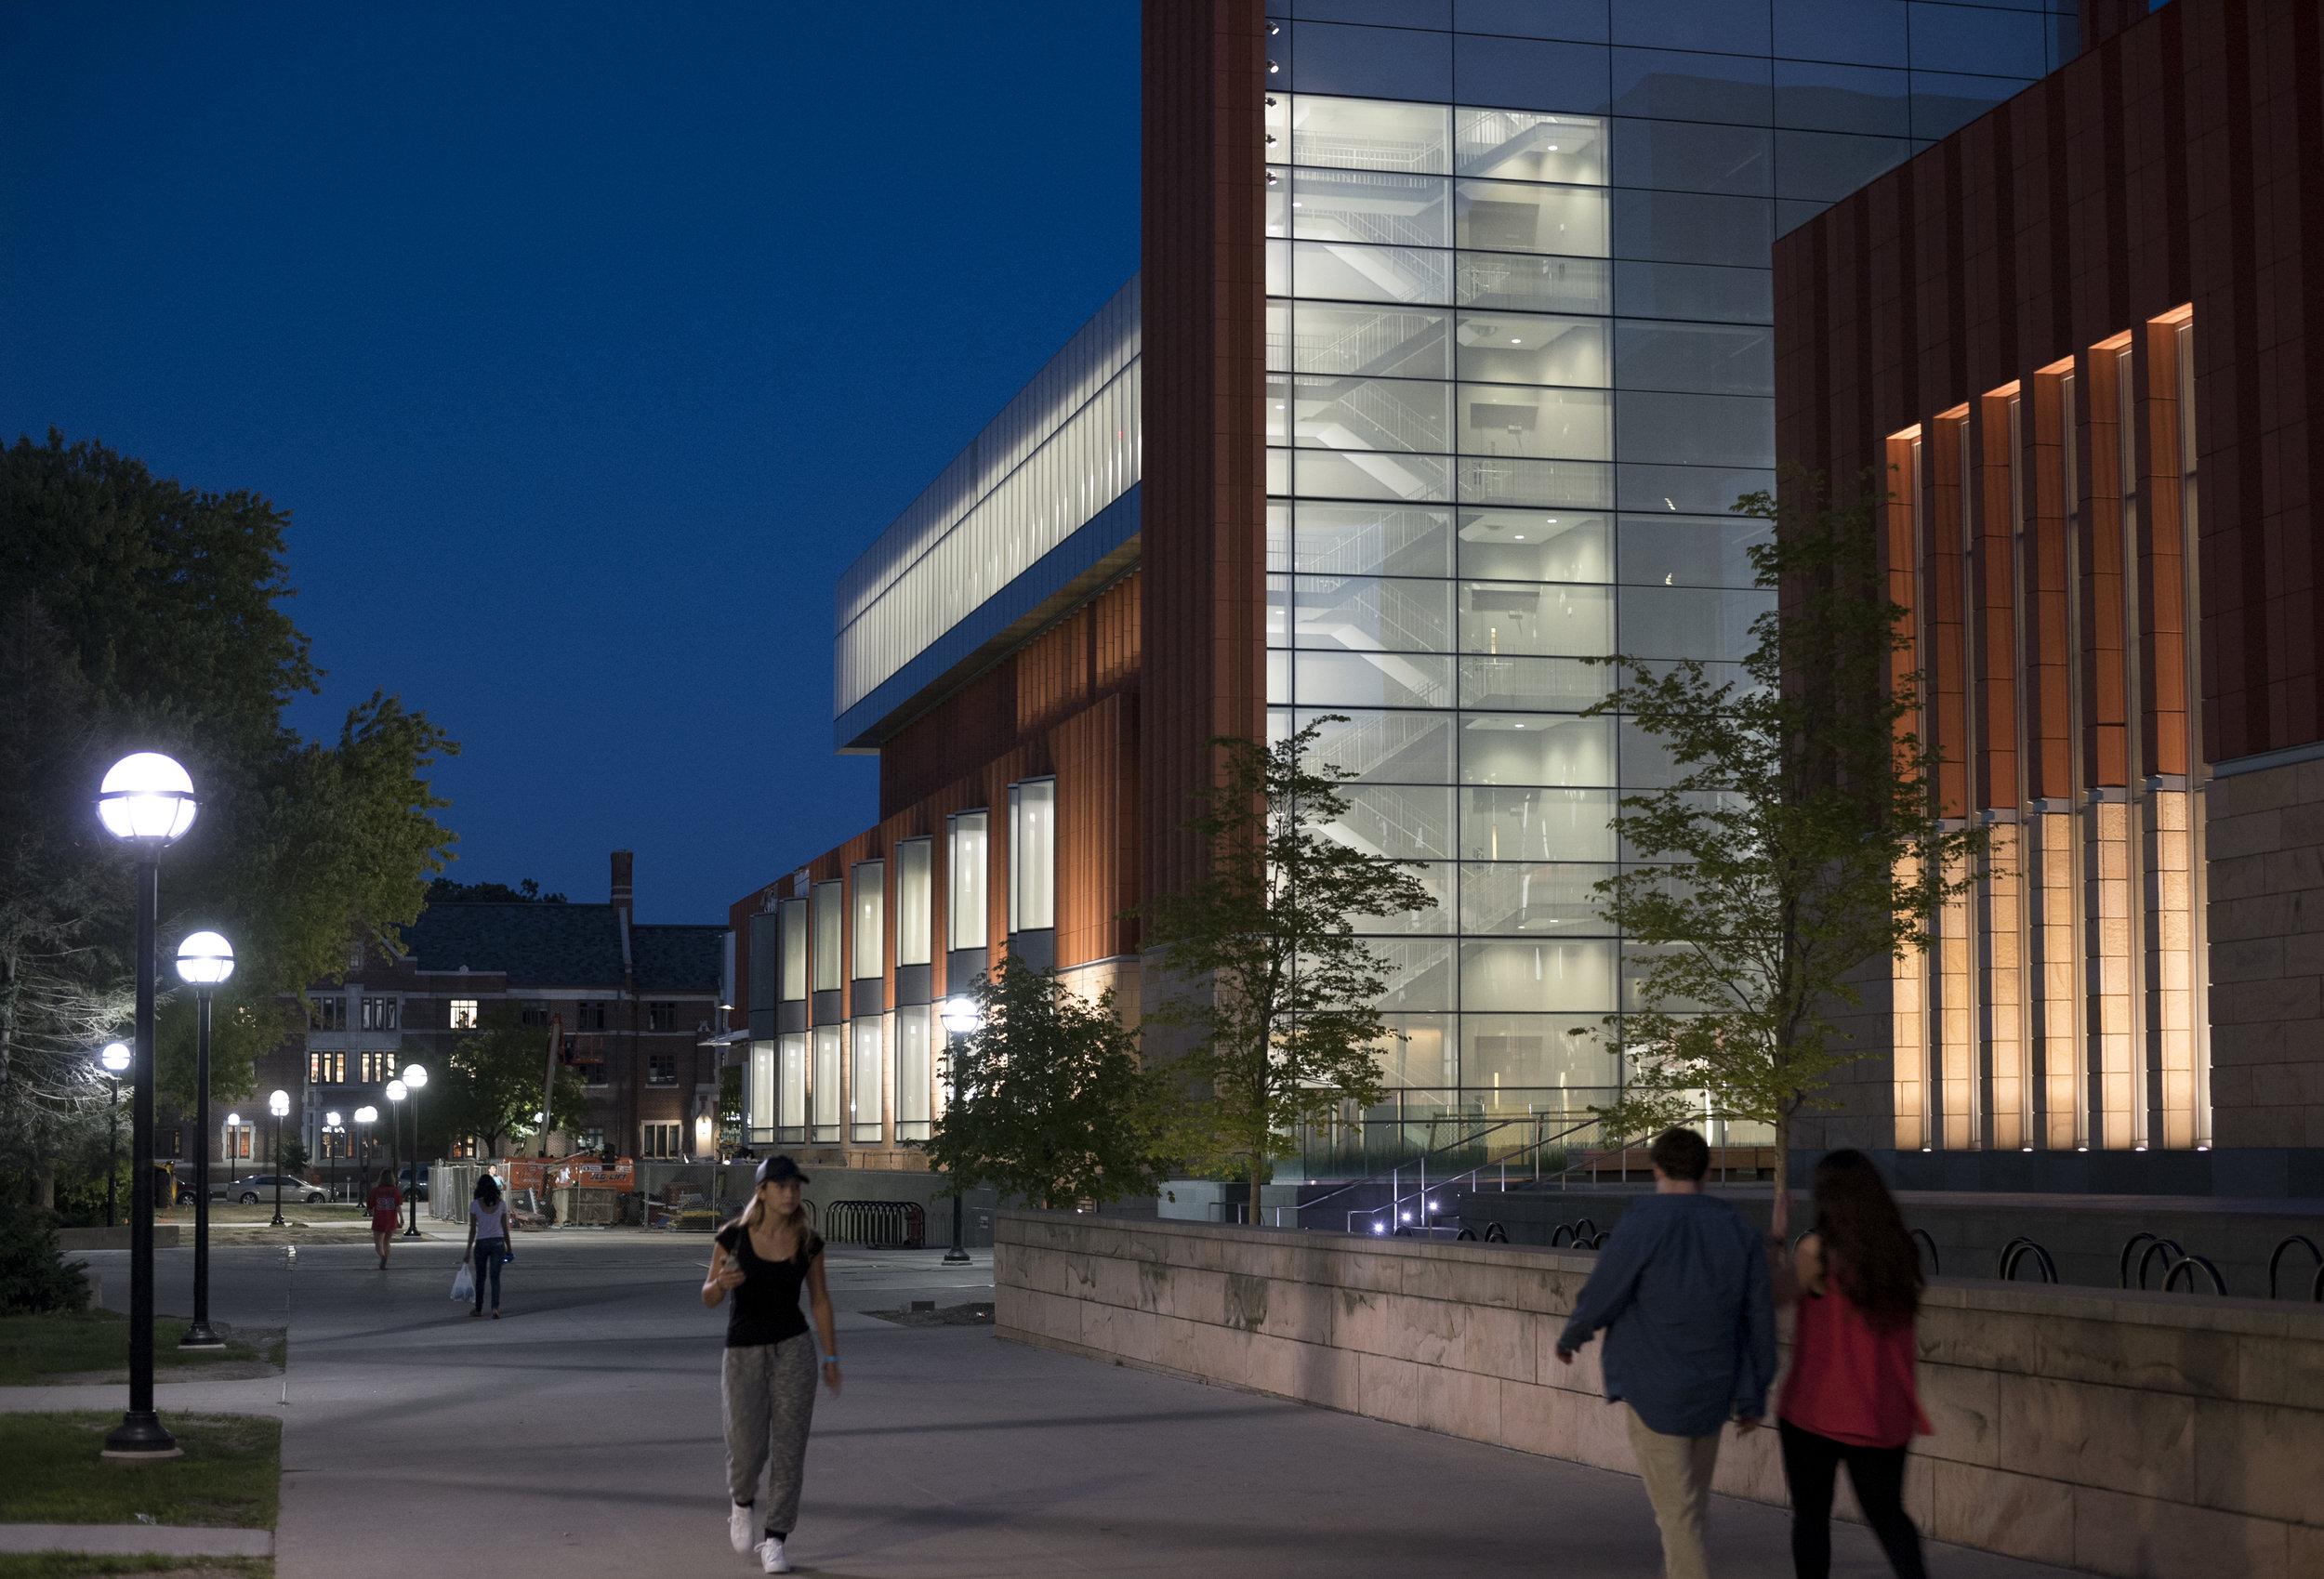 University Of Michigan Ross School Of Business - Jeff T. Blau Hall And Kresge Hall